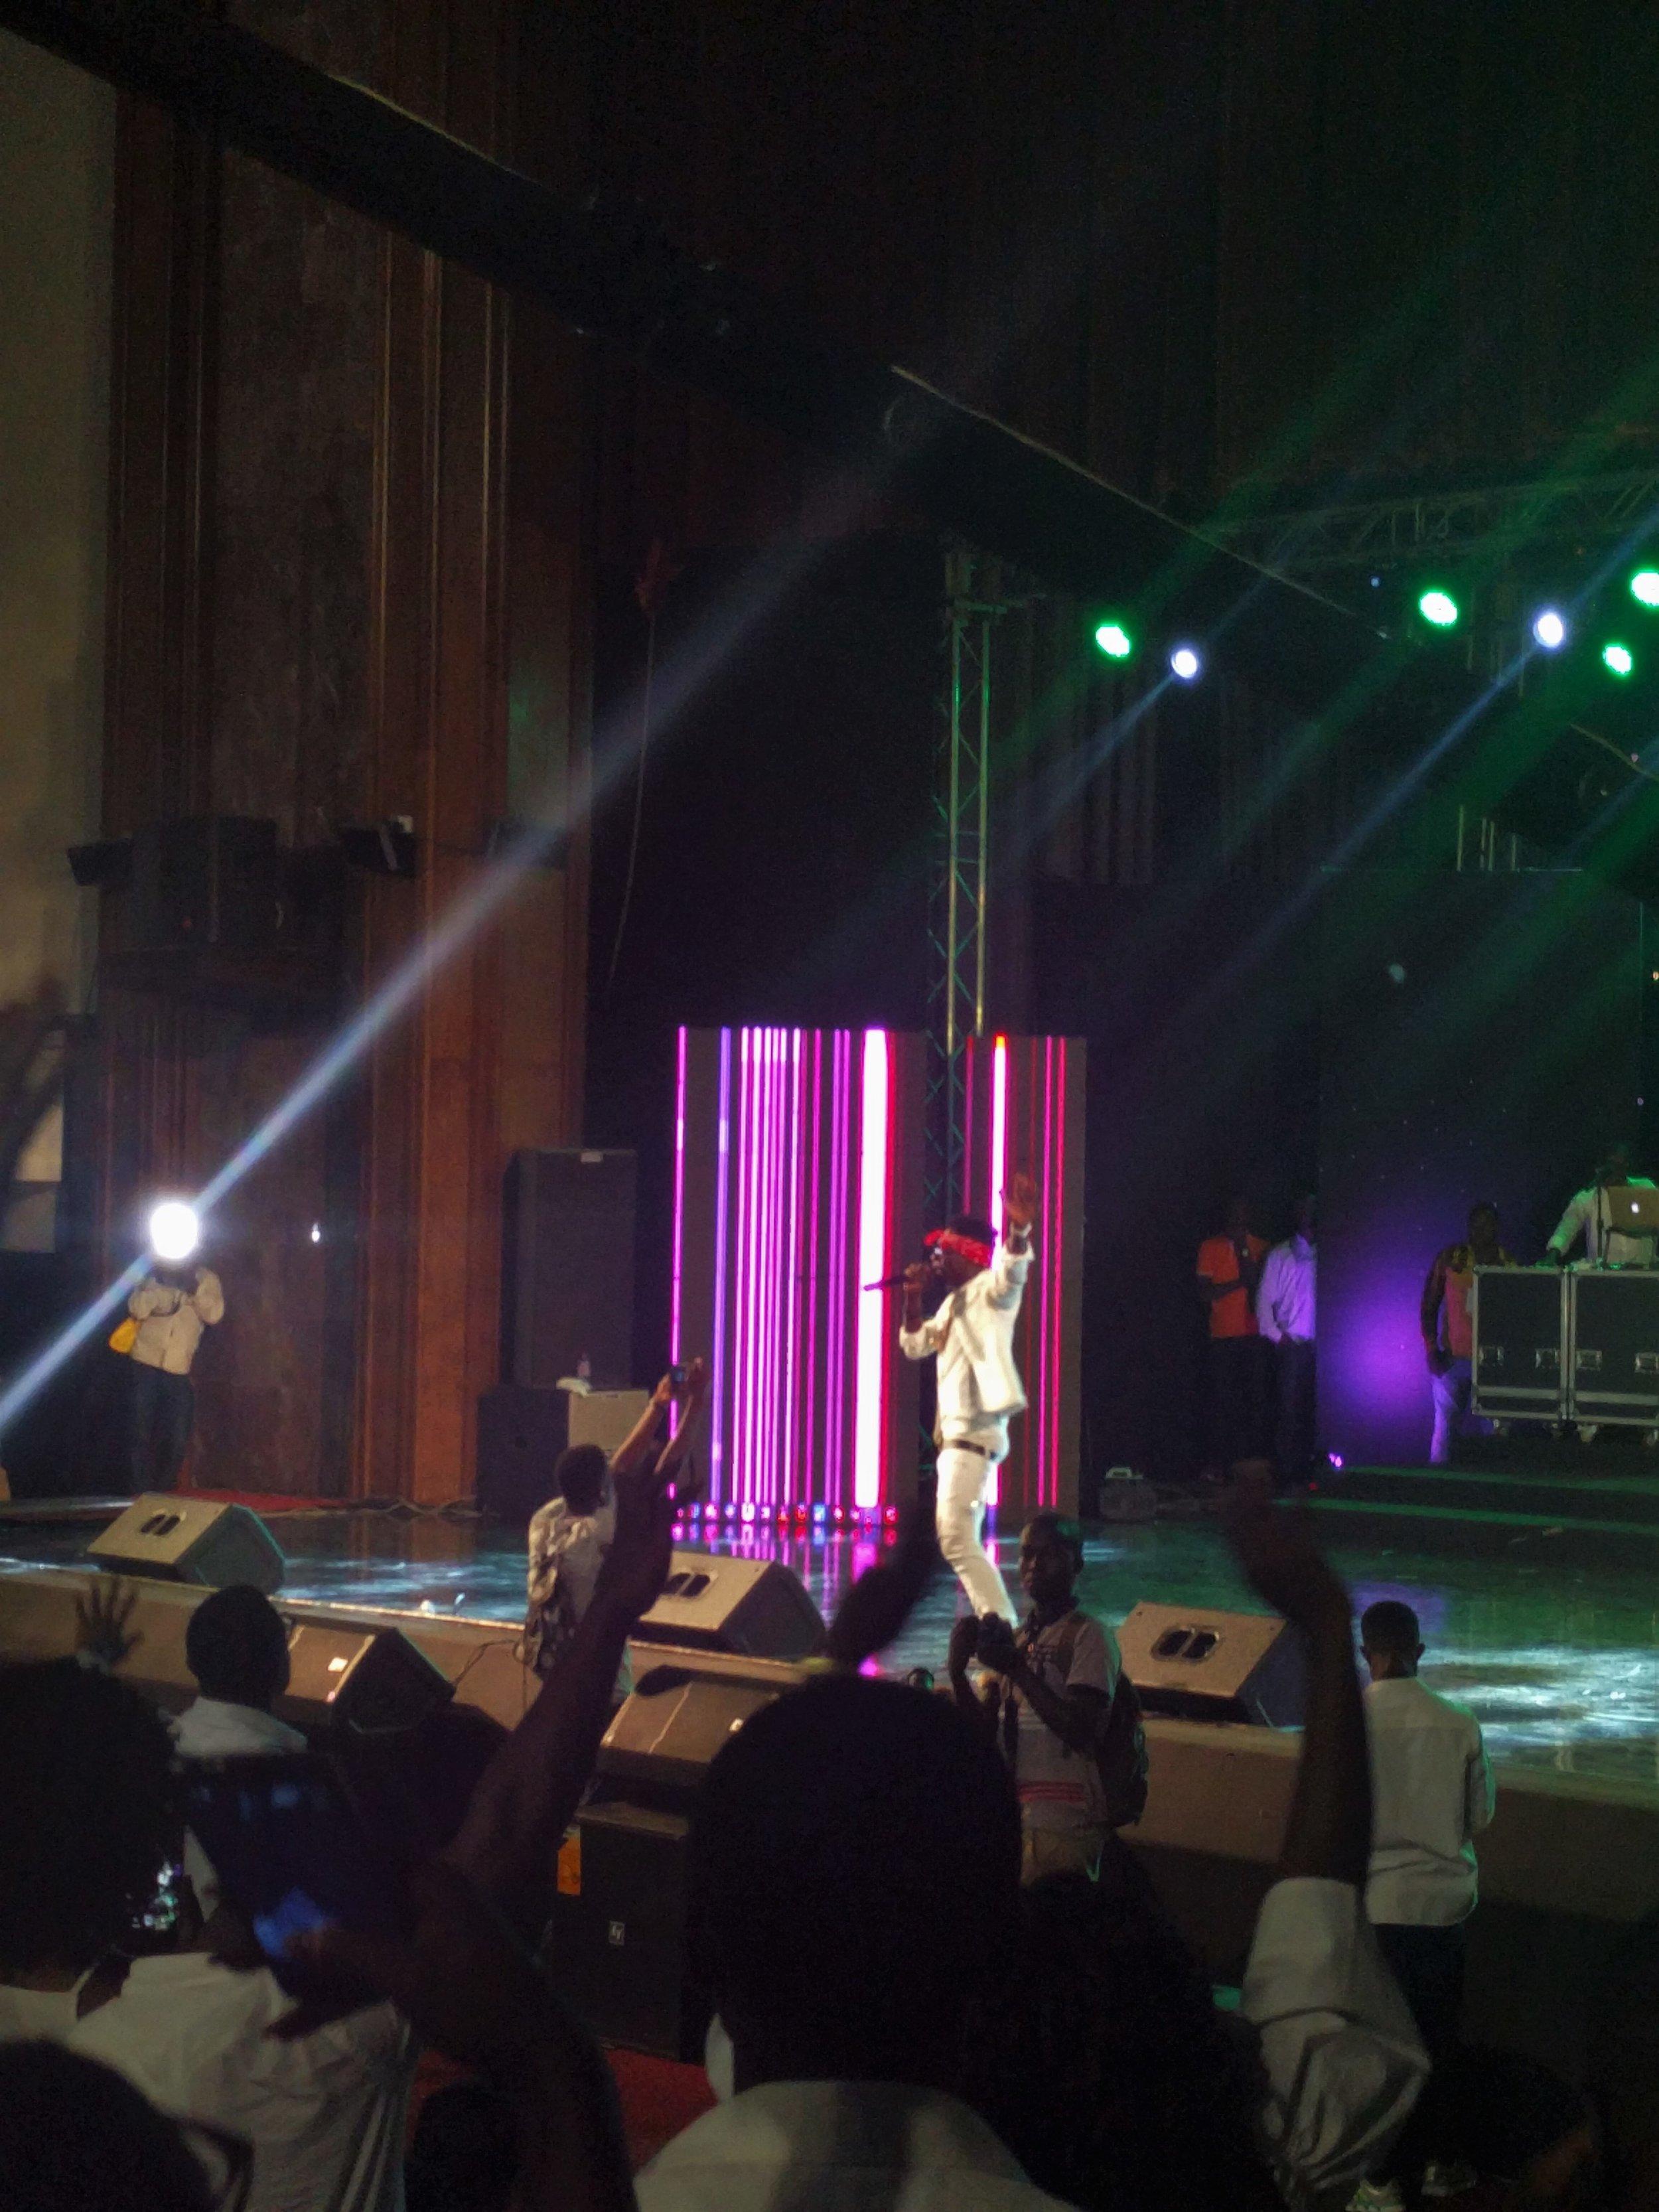 Shatta Wale concert